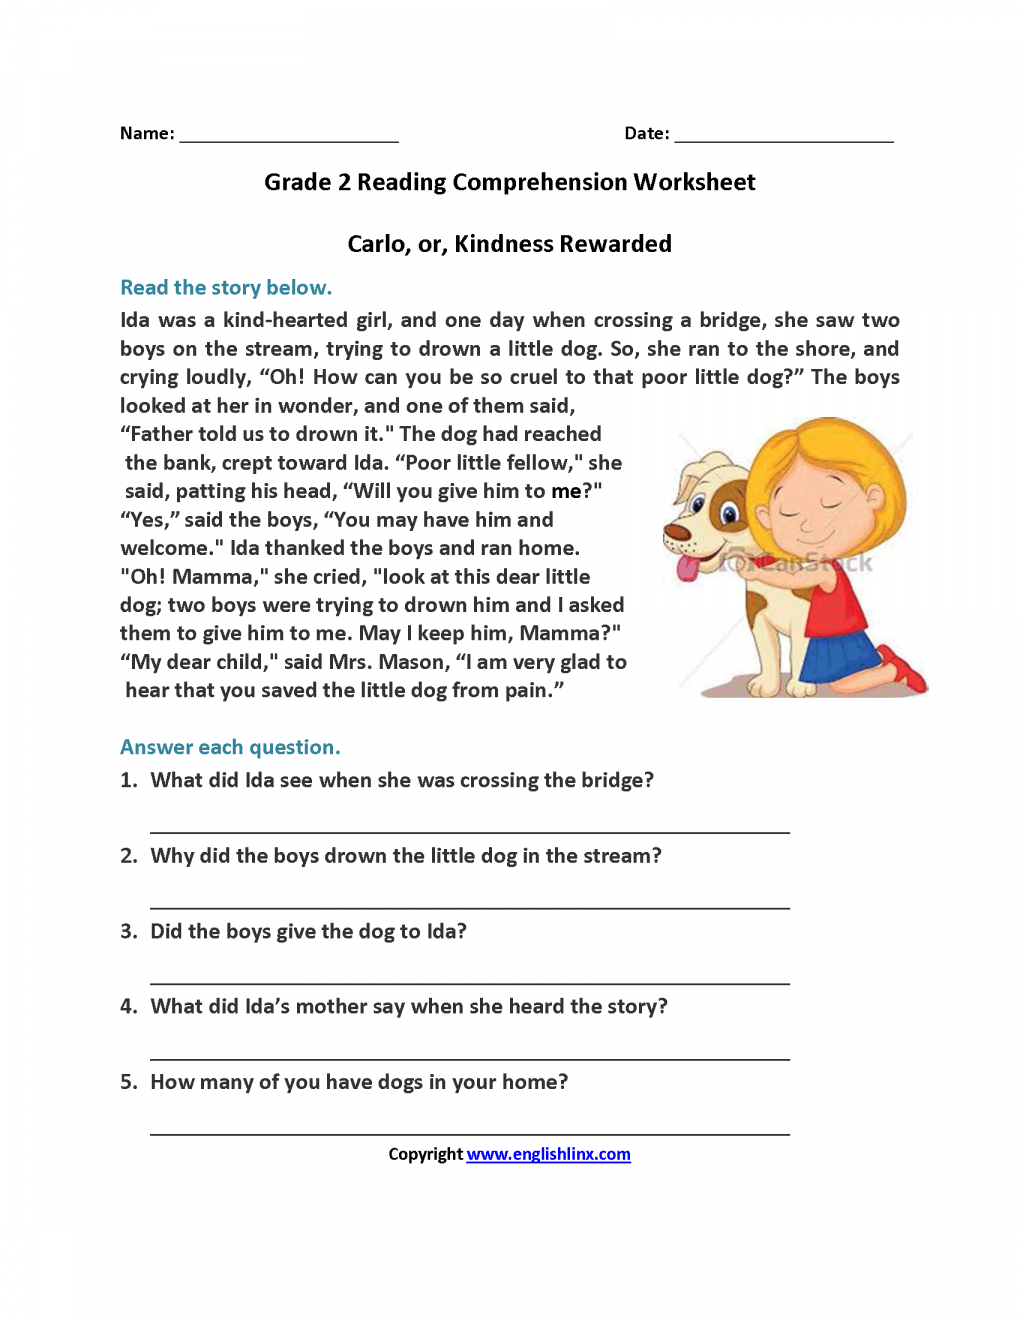 Free Printable Second Grade Reading Comprehension Worksheets | Free Printable Reading Worksheets